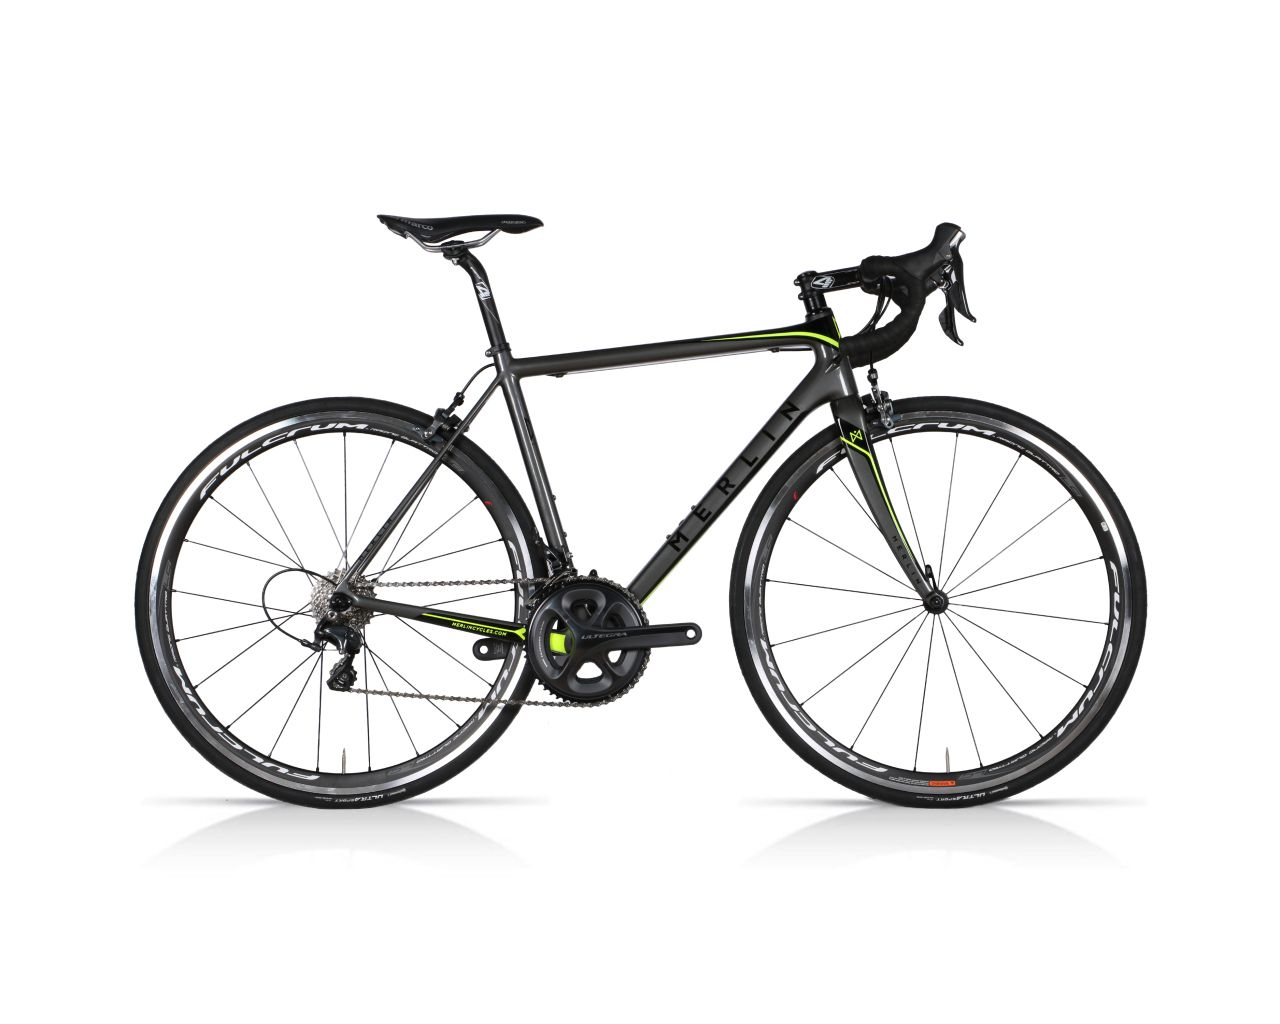 2017 Merlin Nitro Sl Aka Ridley Helium Sl For 2000 Usd Bike